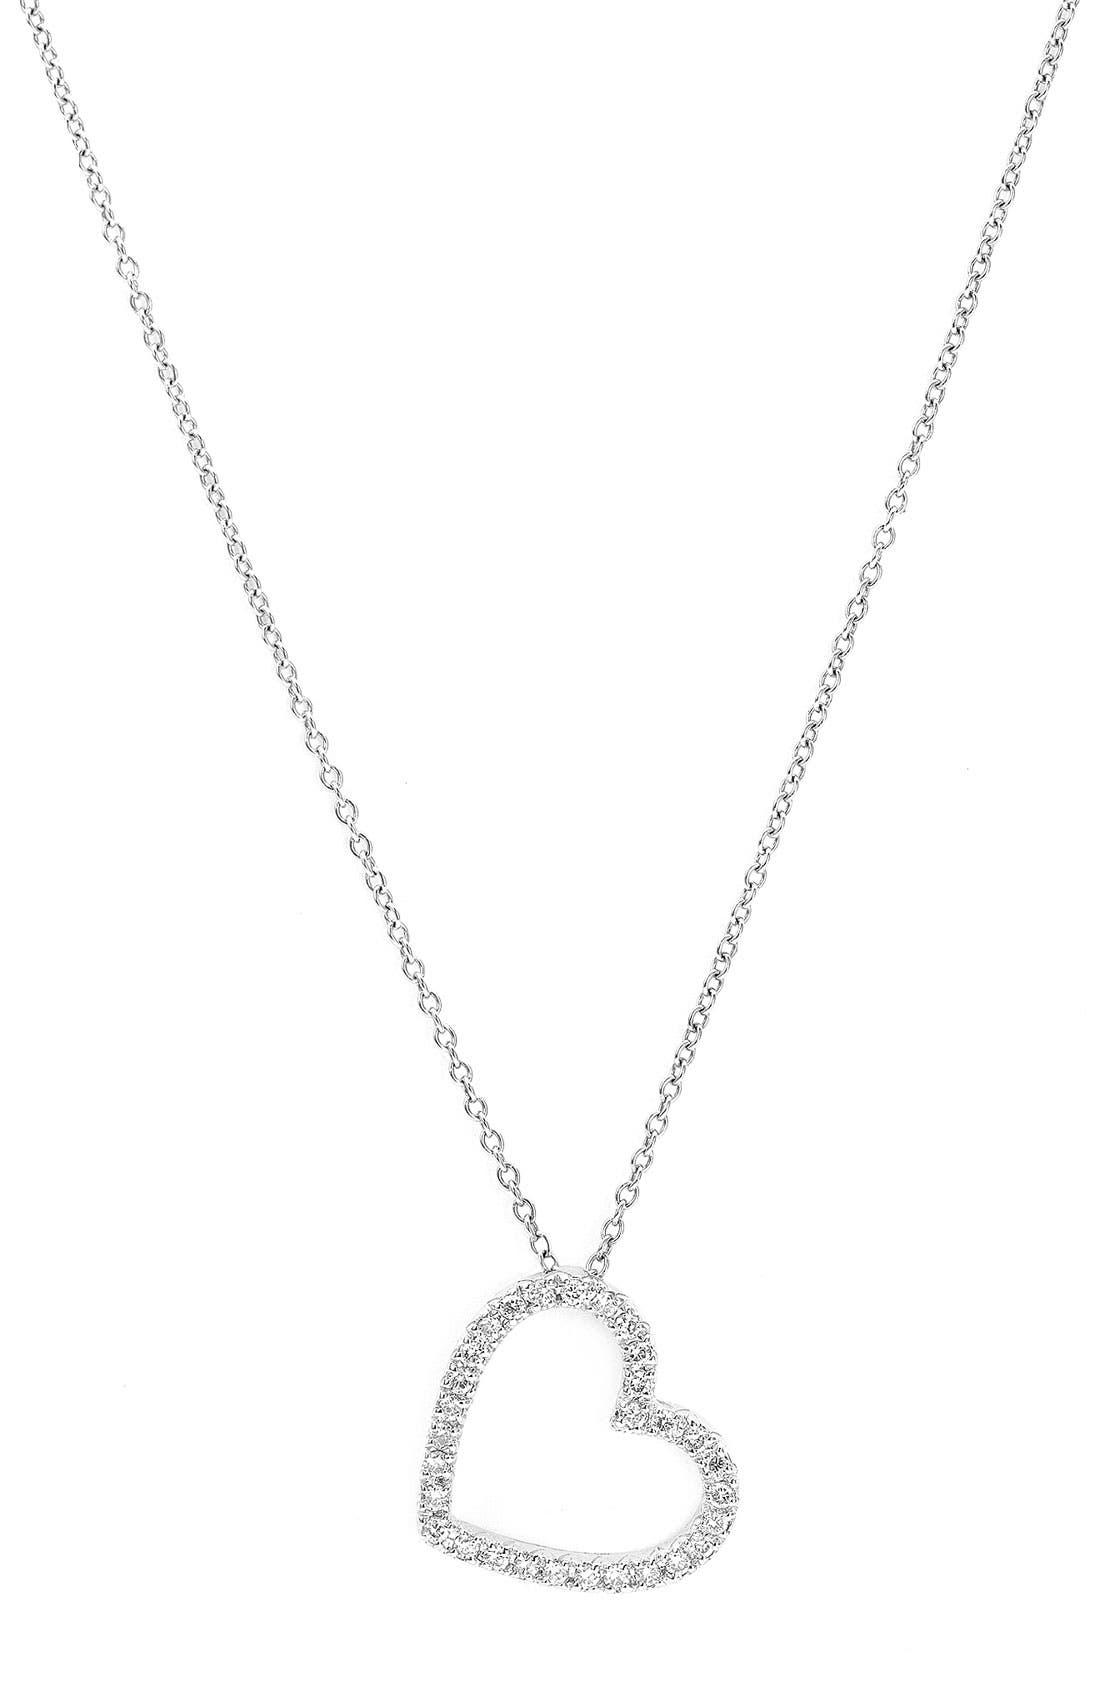 Main Image - Kwiat Small Silhouette Diamond Necklace